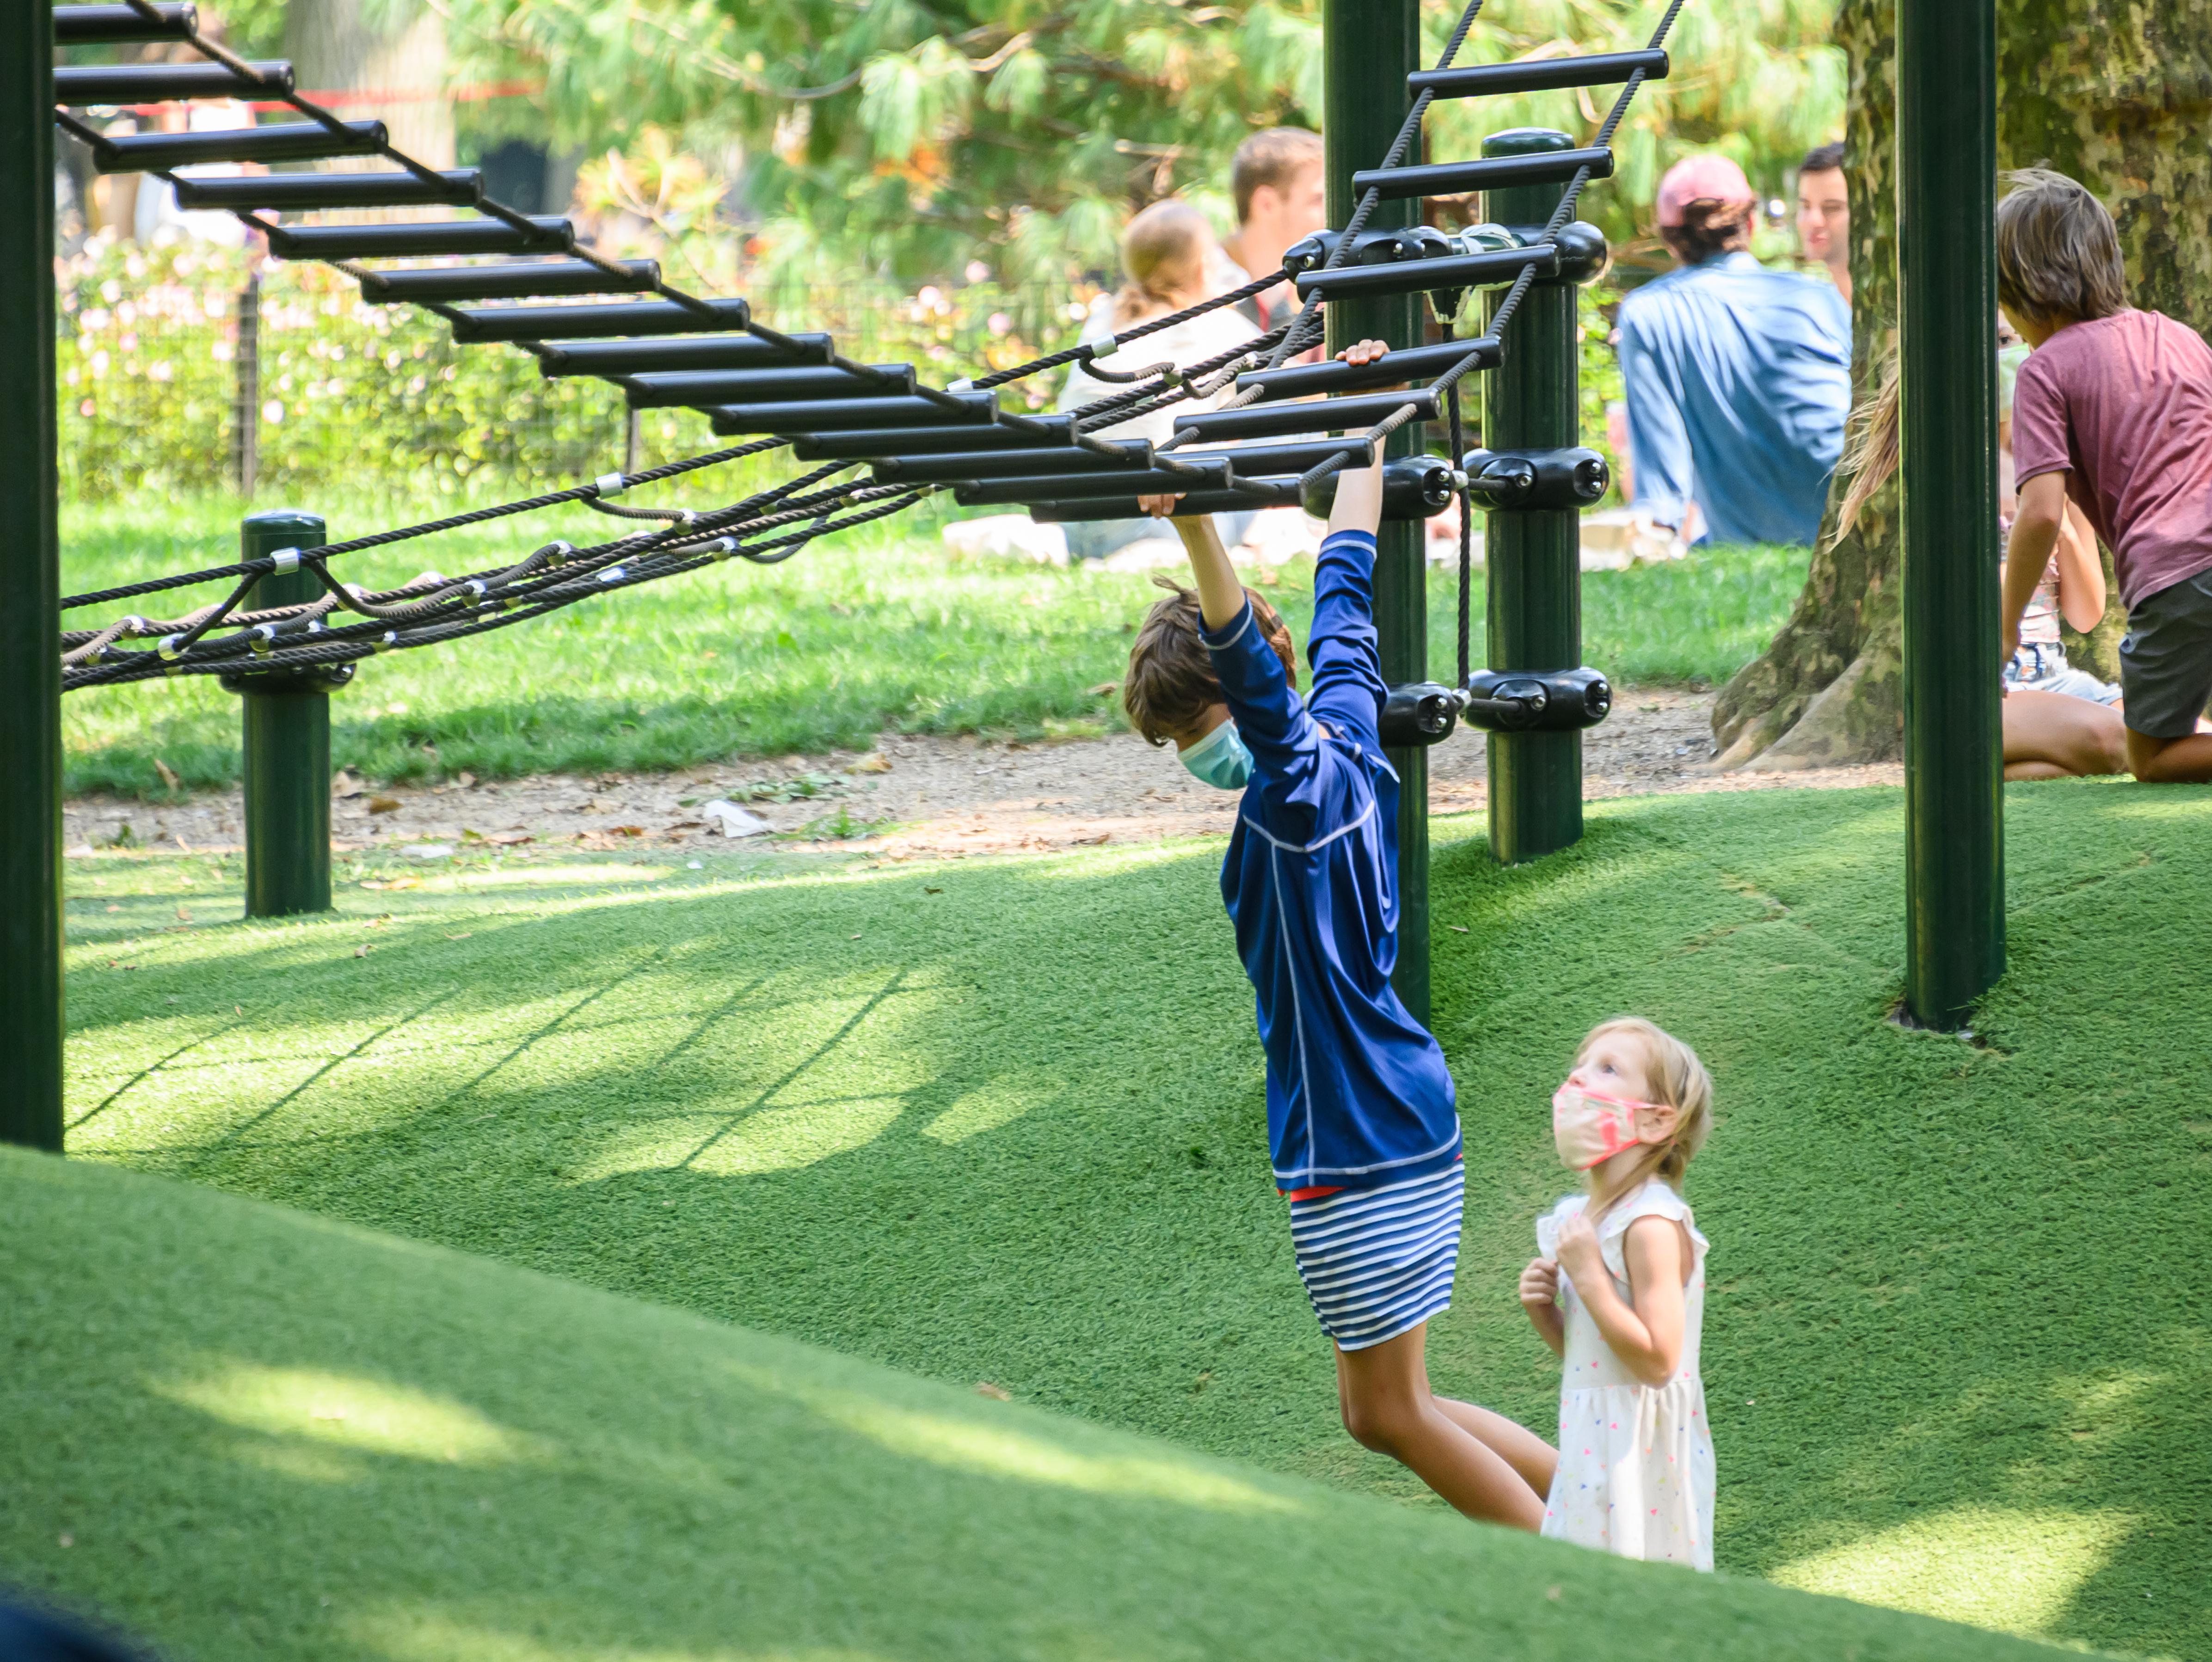 Children playing on a playground wearing masks.